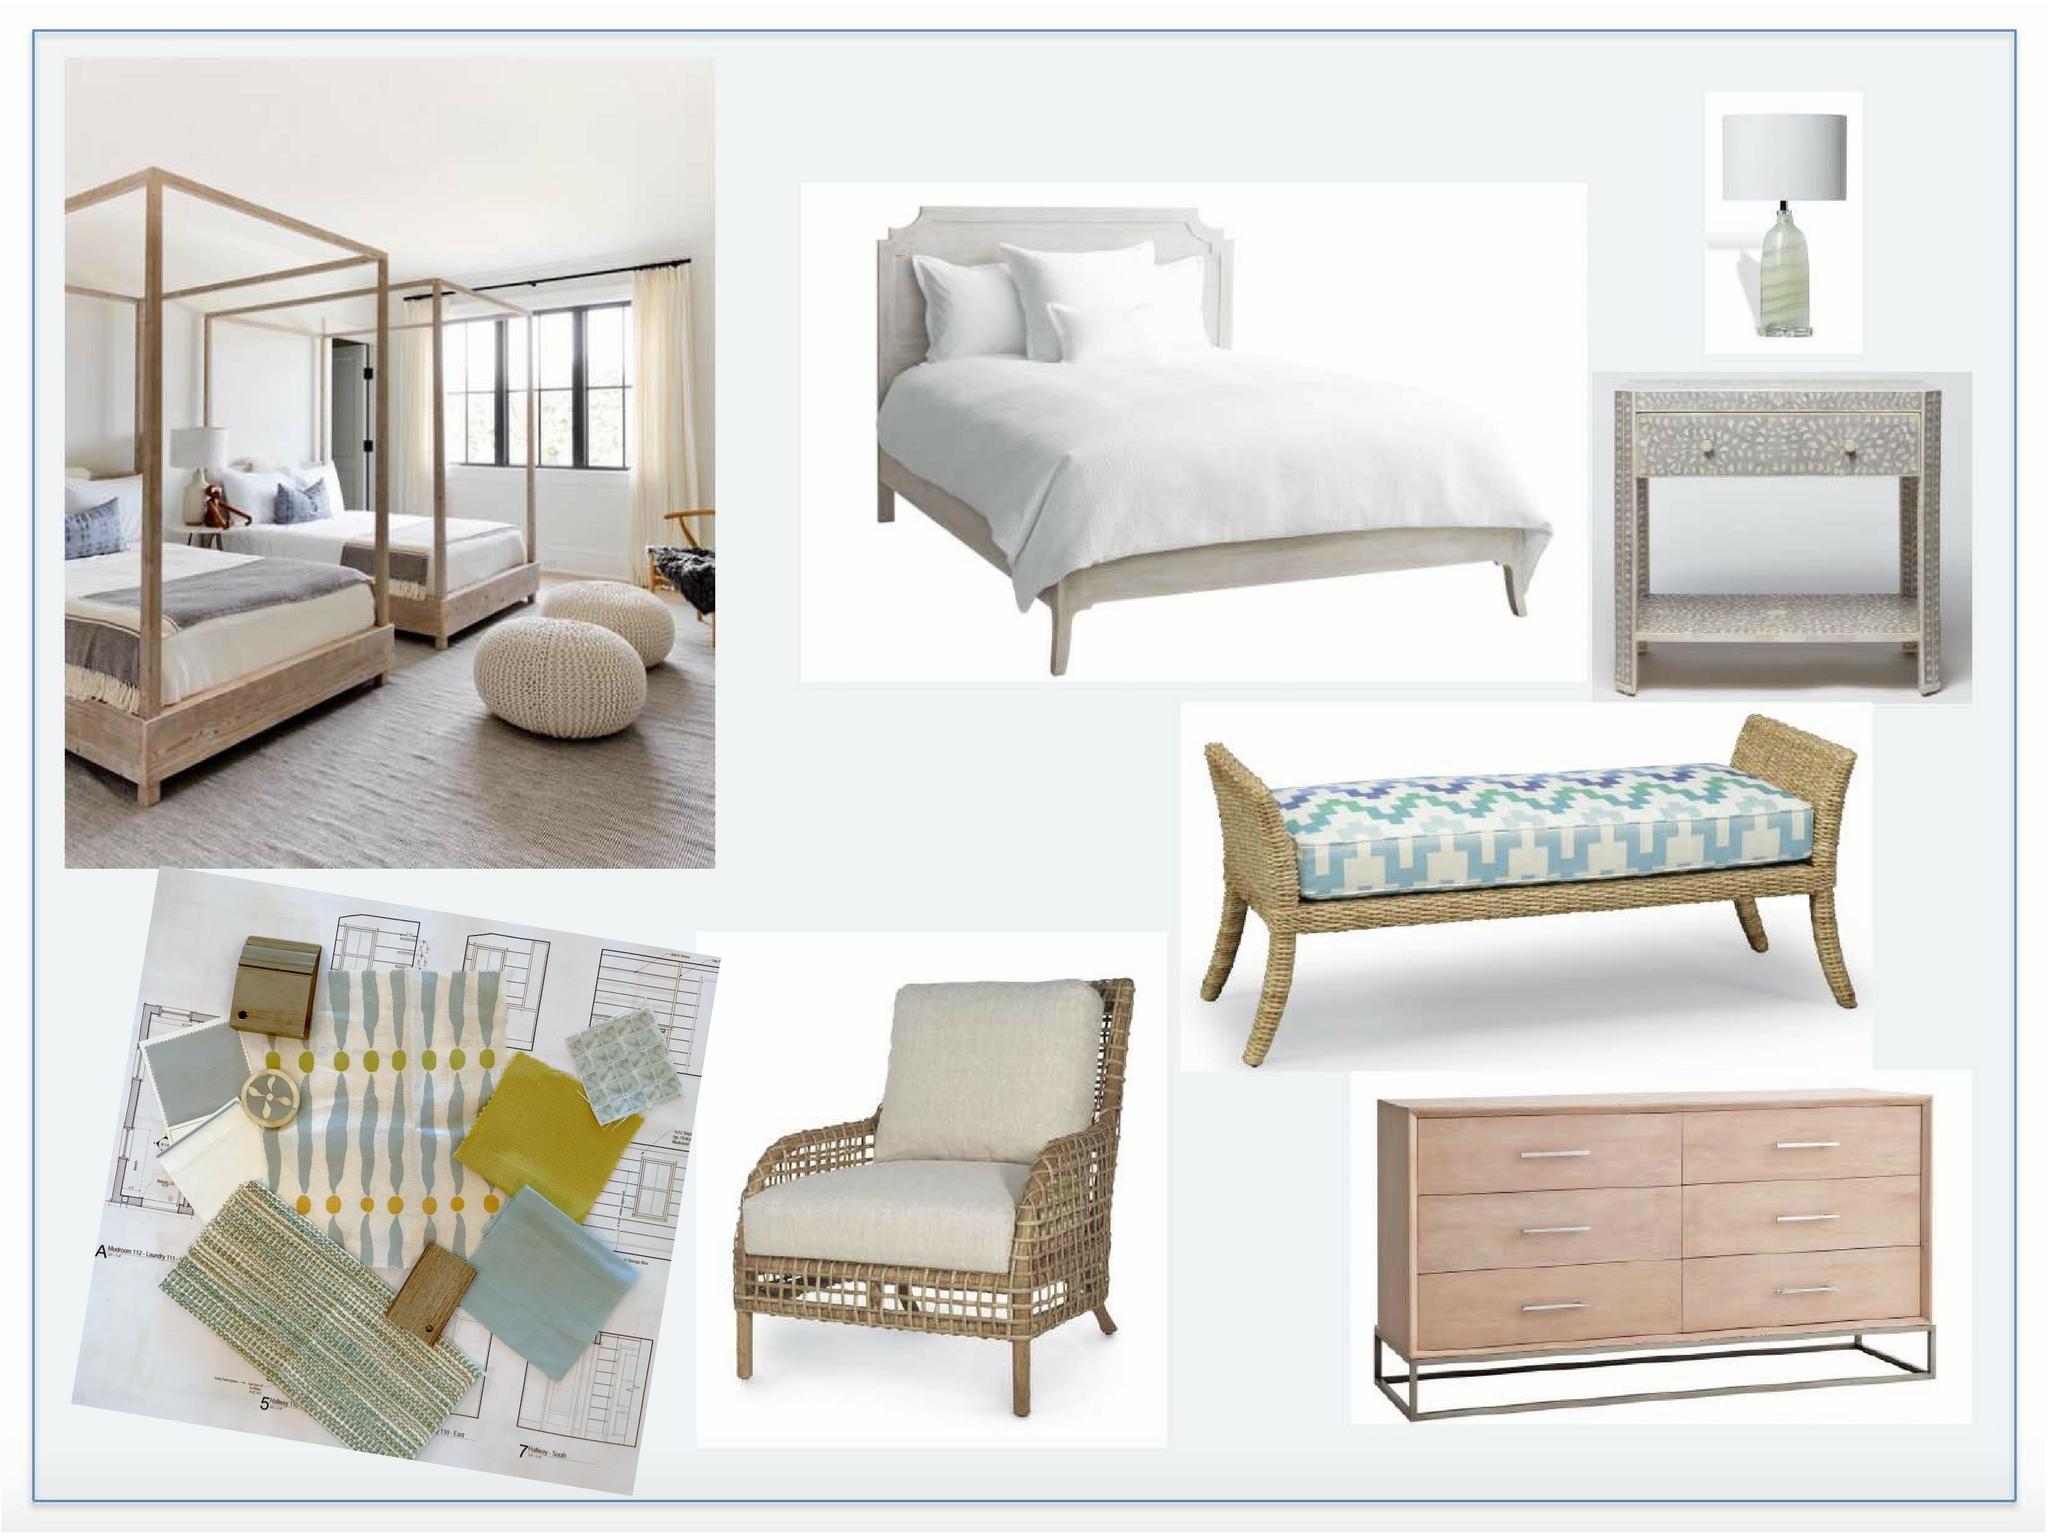 Nantucket Summer Home Girl's Room Design